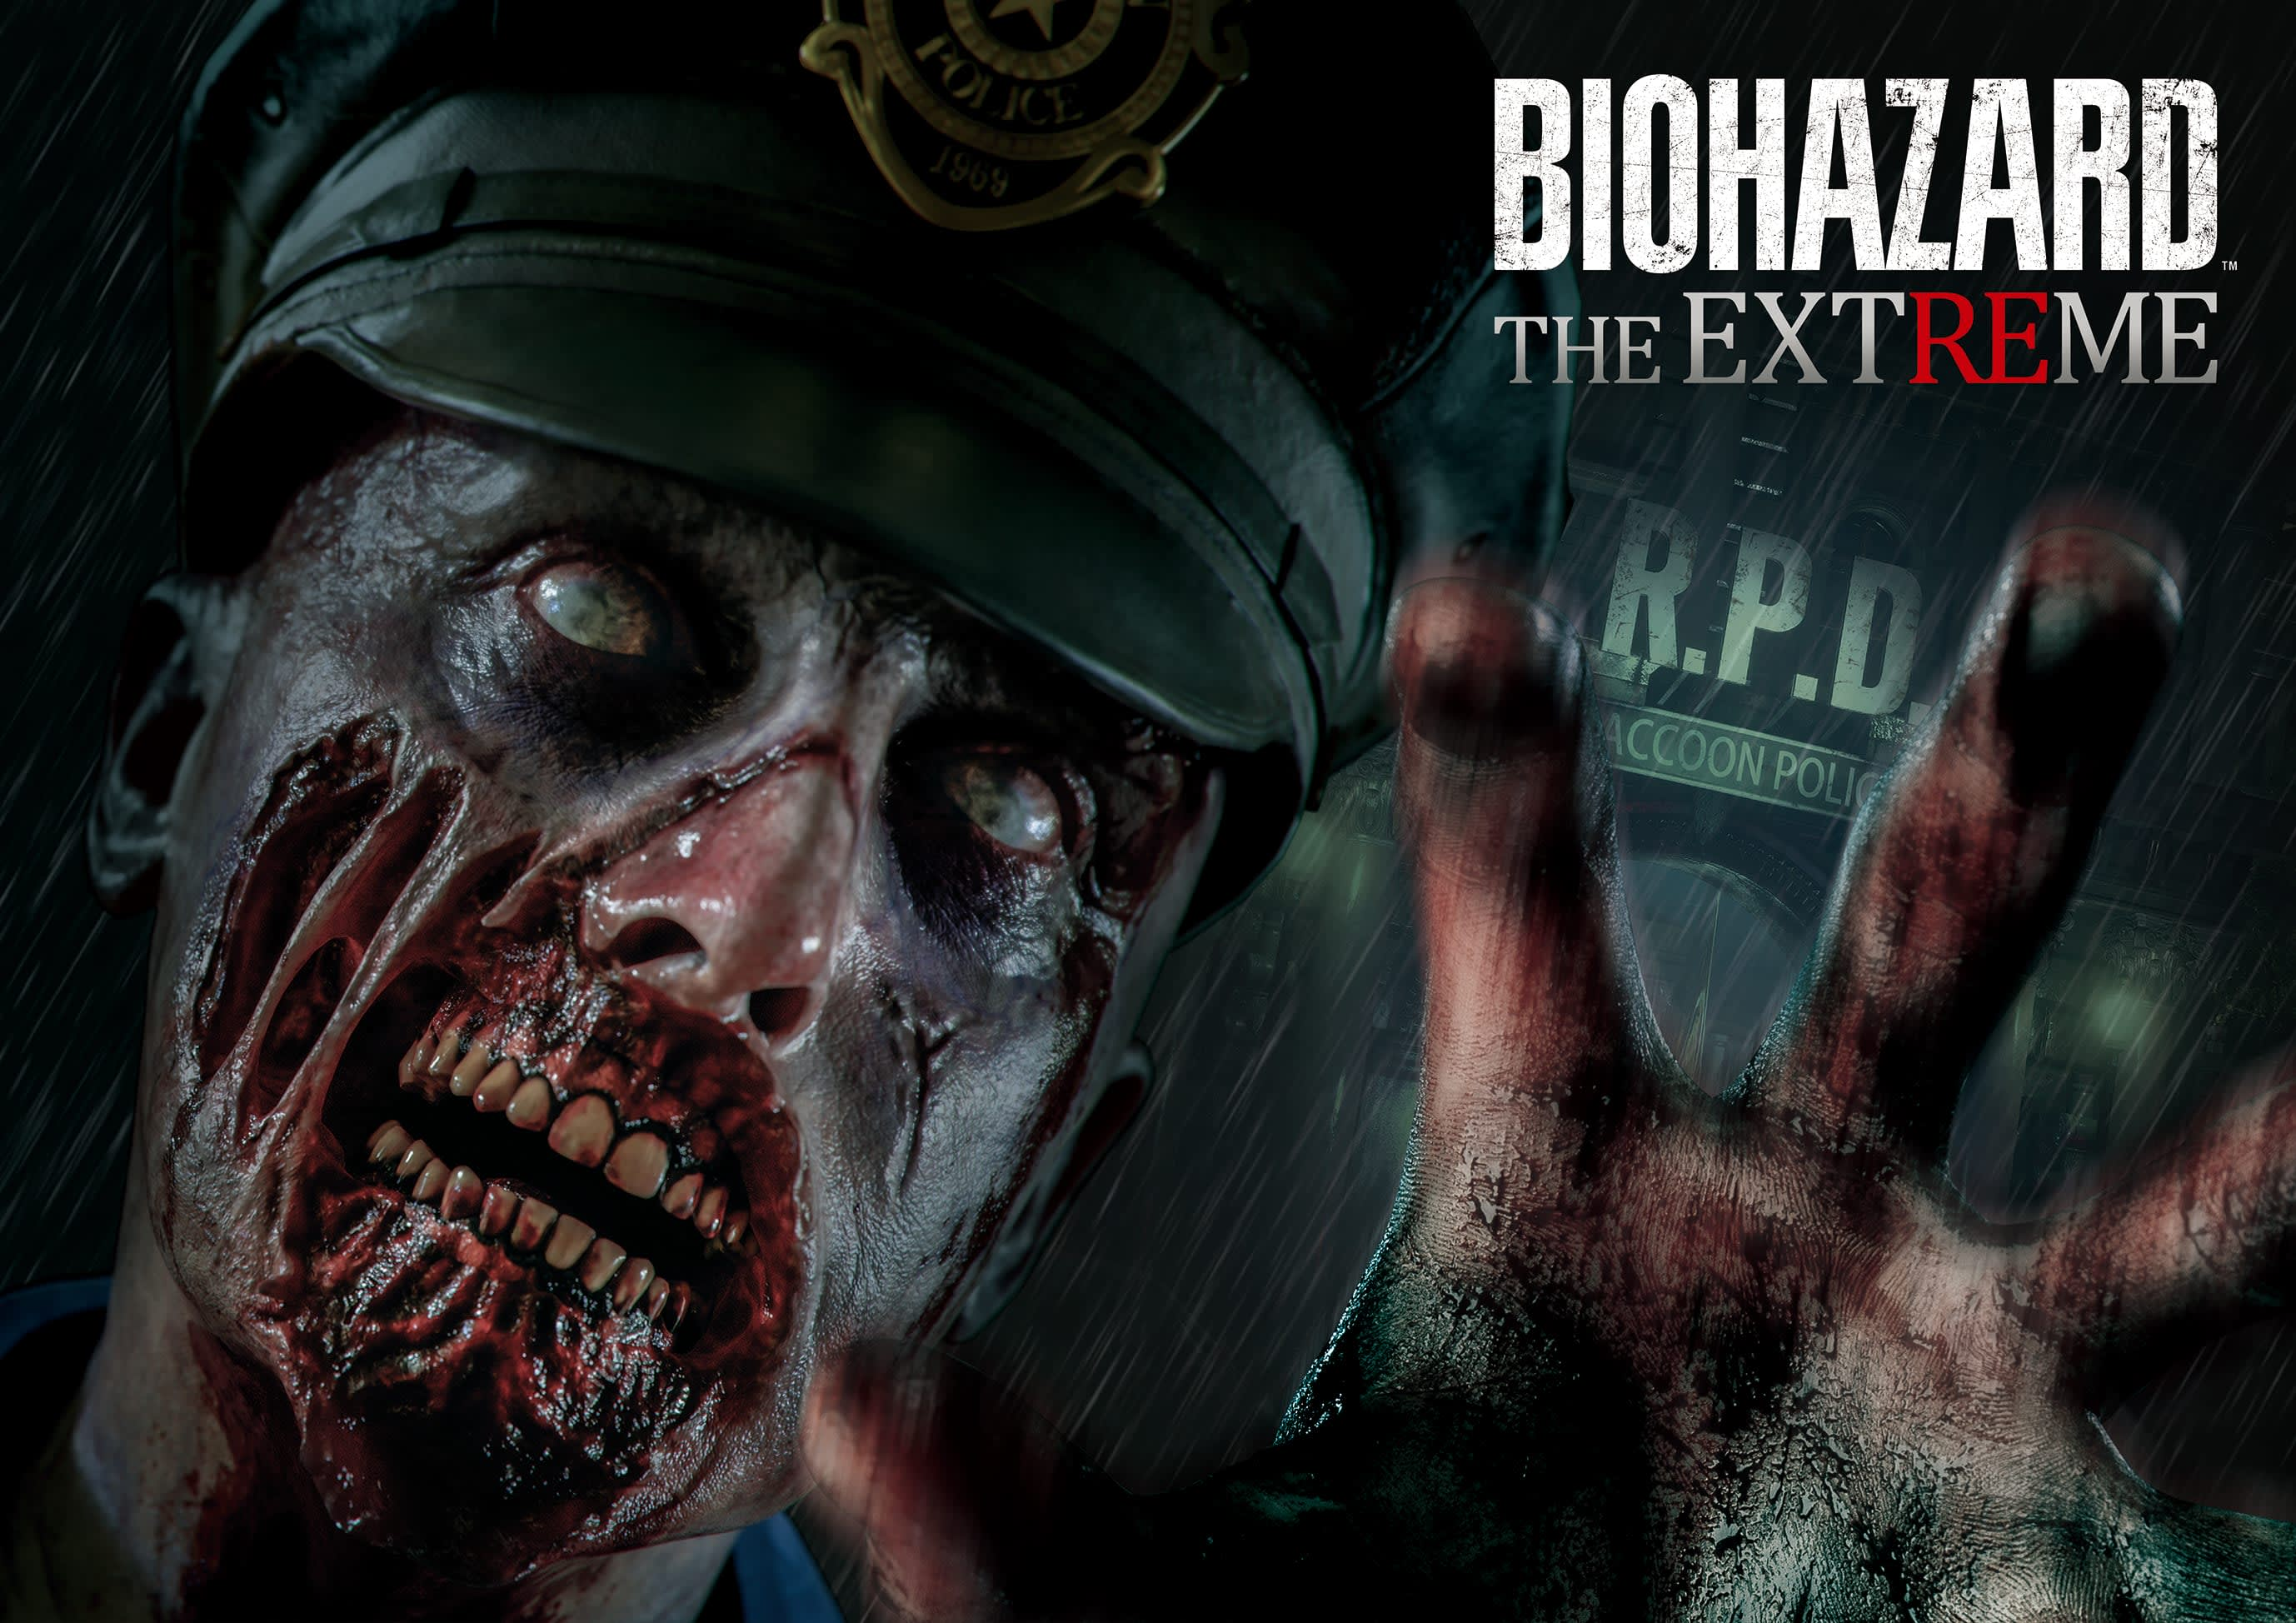 Biohazard: The Extreme